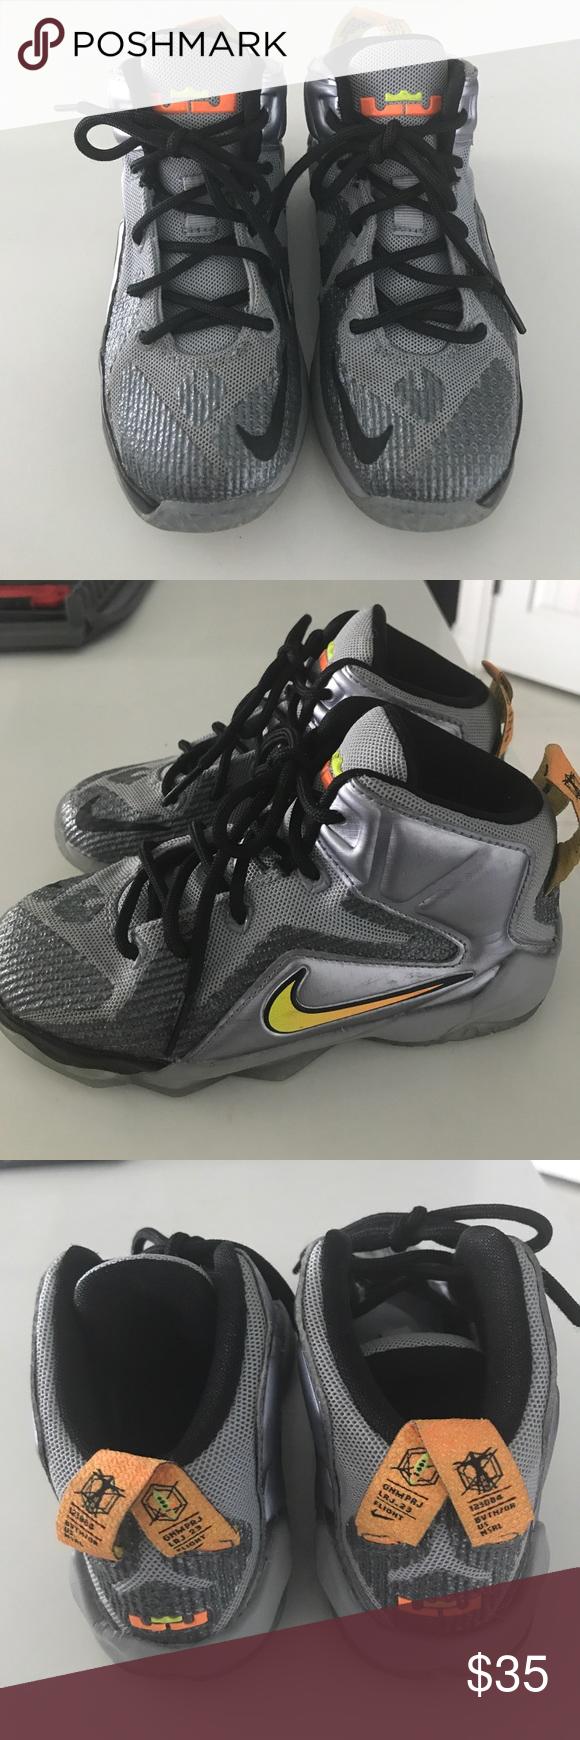 lebron james nike shoes for kids nike trainers